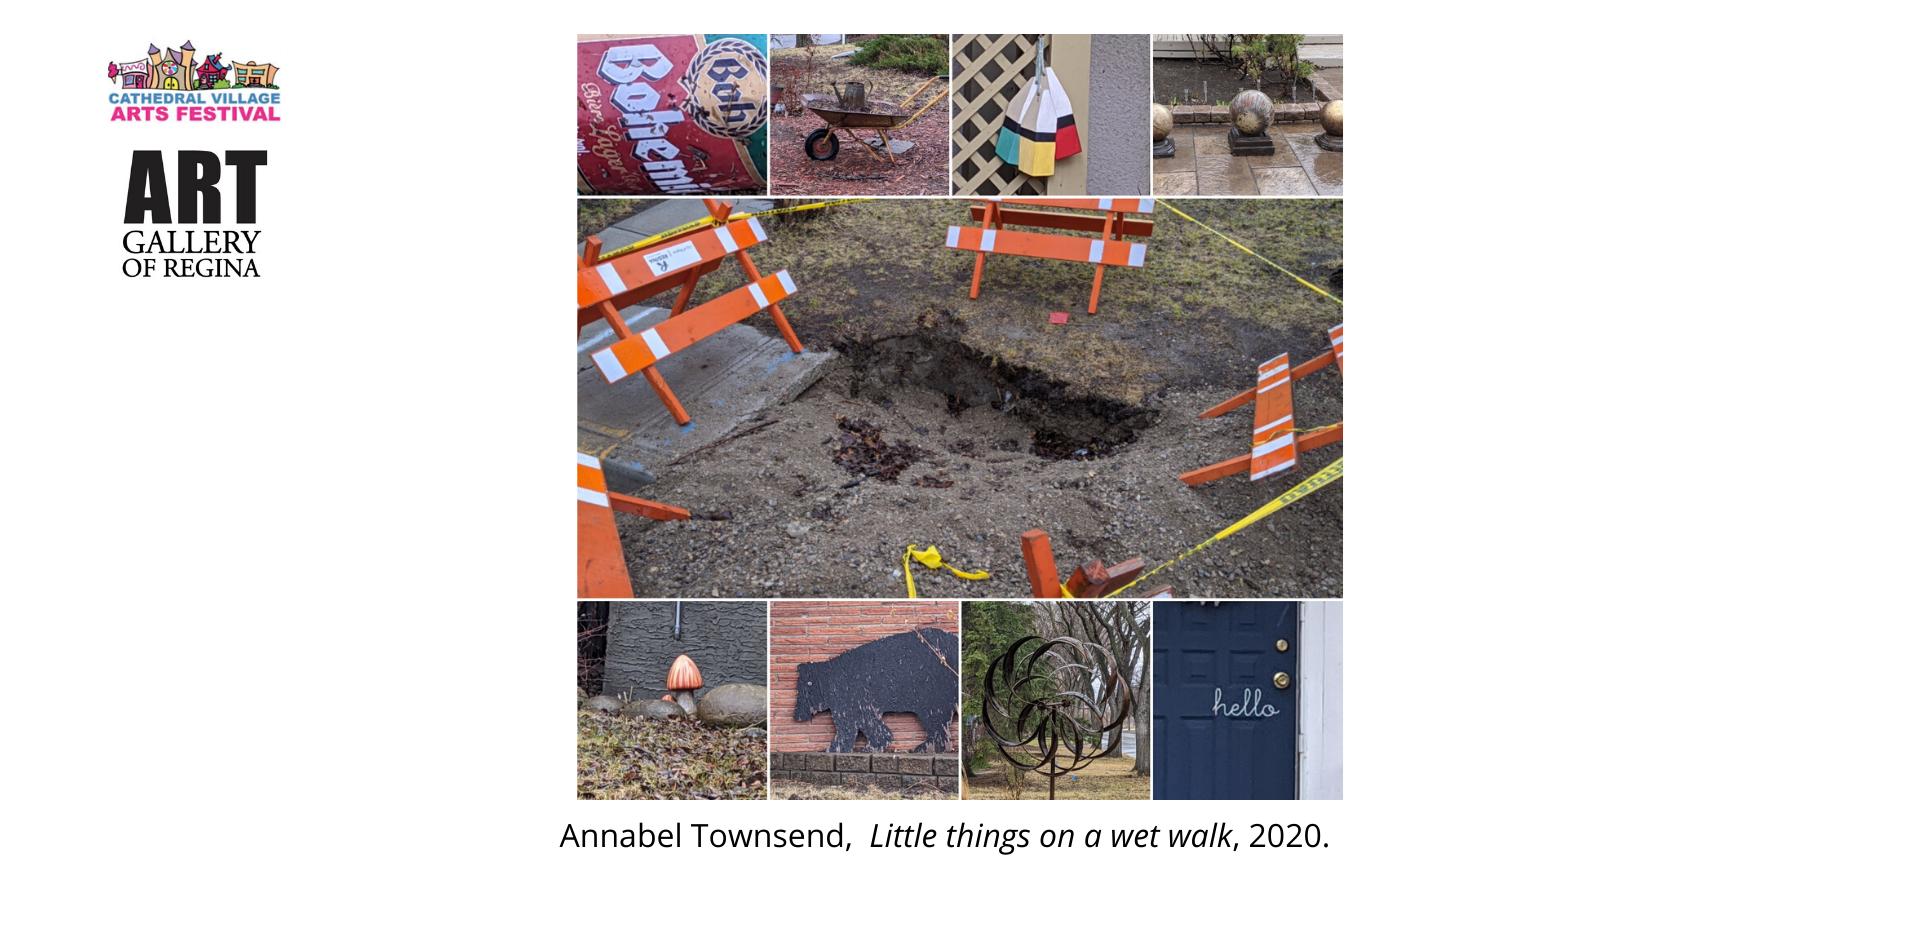 Annabel Townsend,  Little things on a wet walk, 2020.